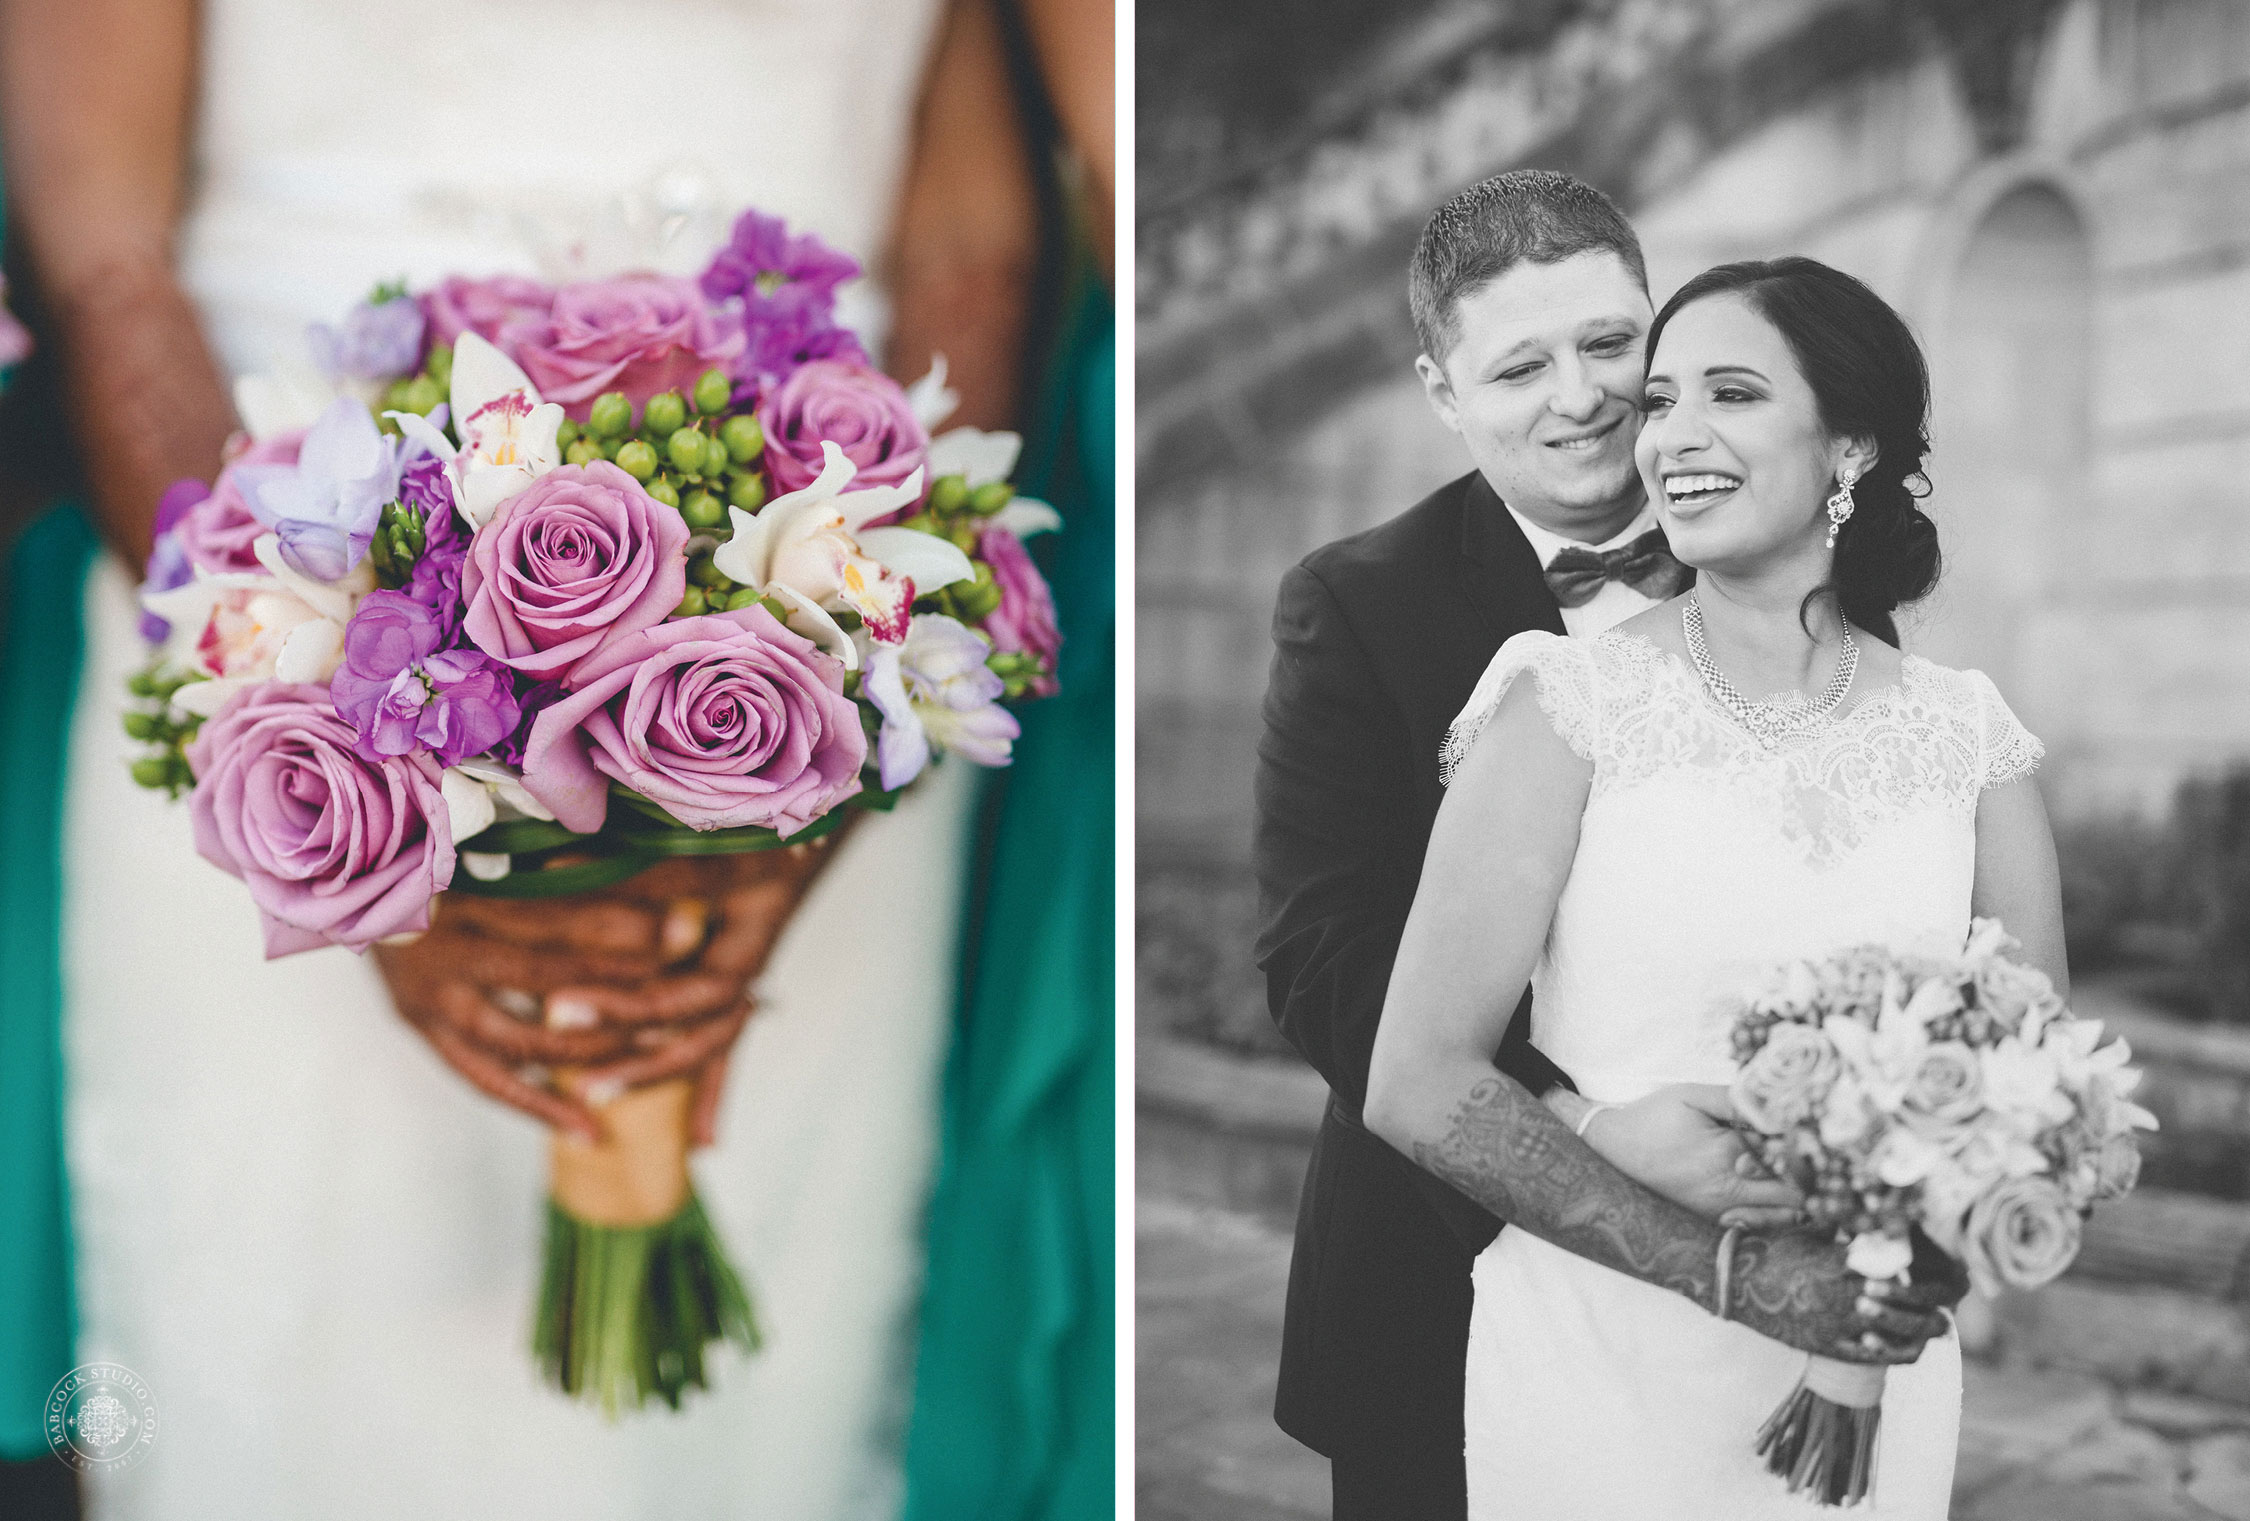 mayuri-brent-indian-wedding-photographer-dayton-ohio-32.jpg